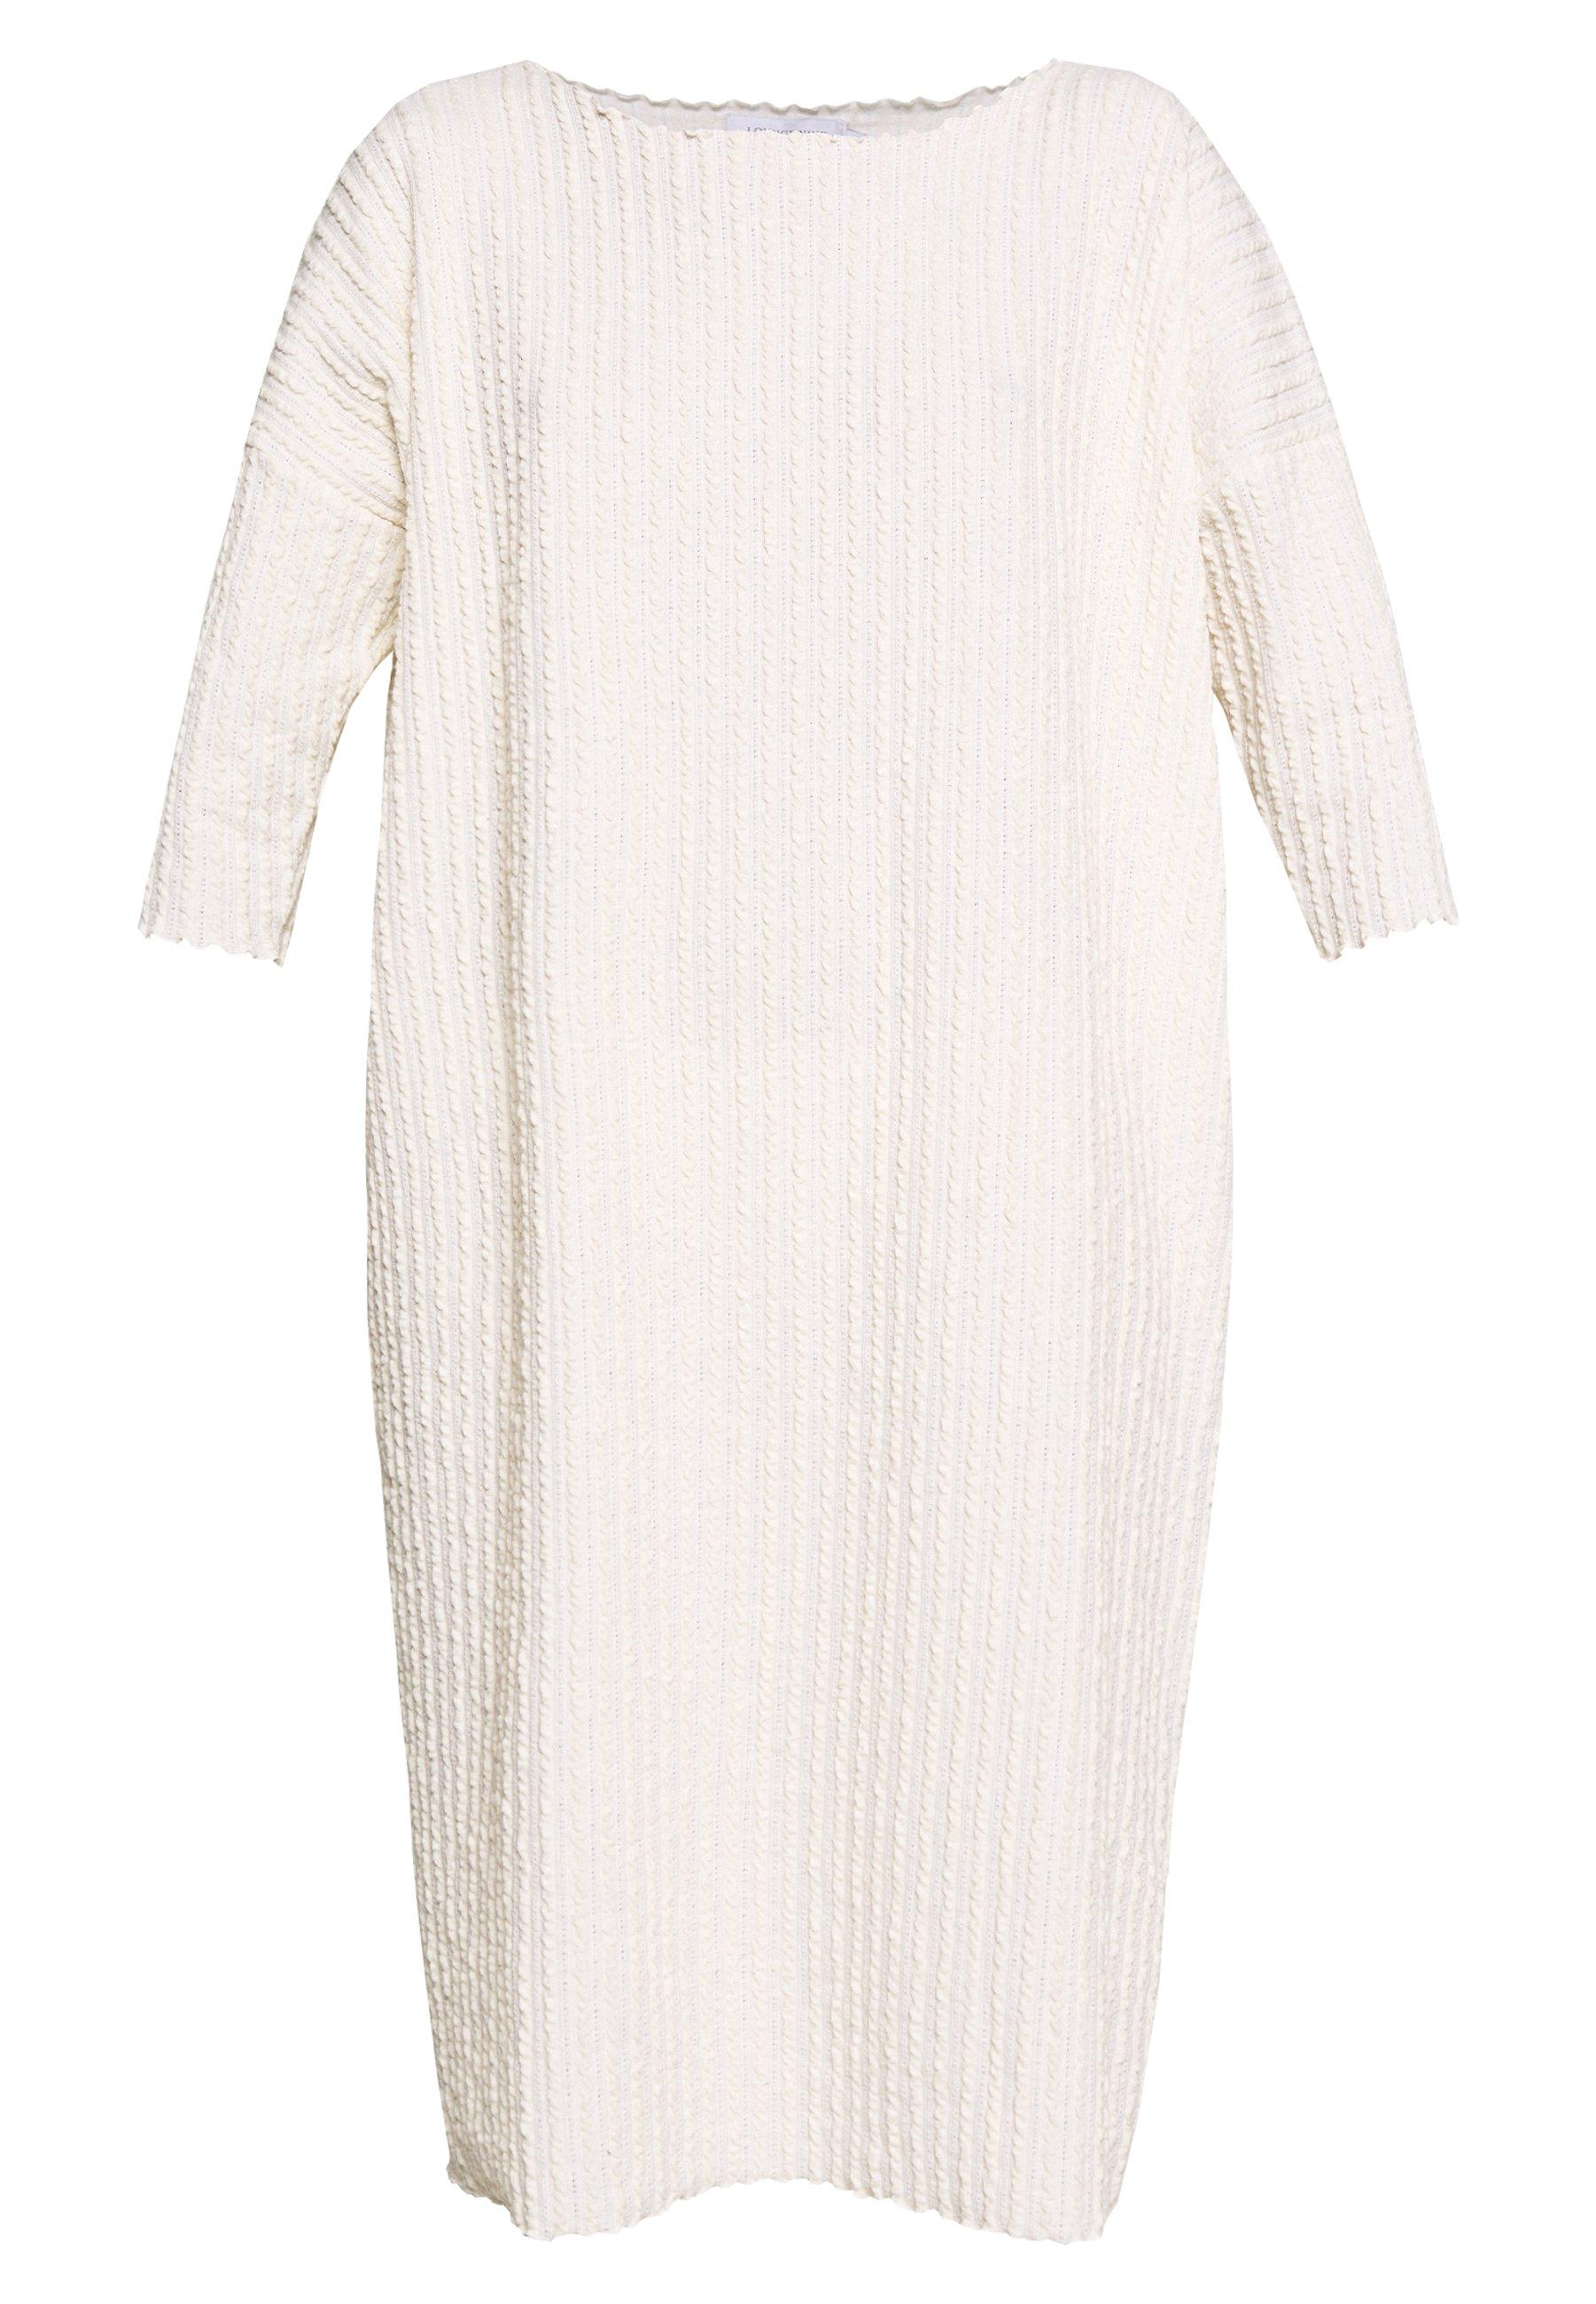 Lounge Nine Kylie Dress - Jumper White Swan